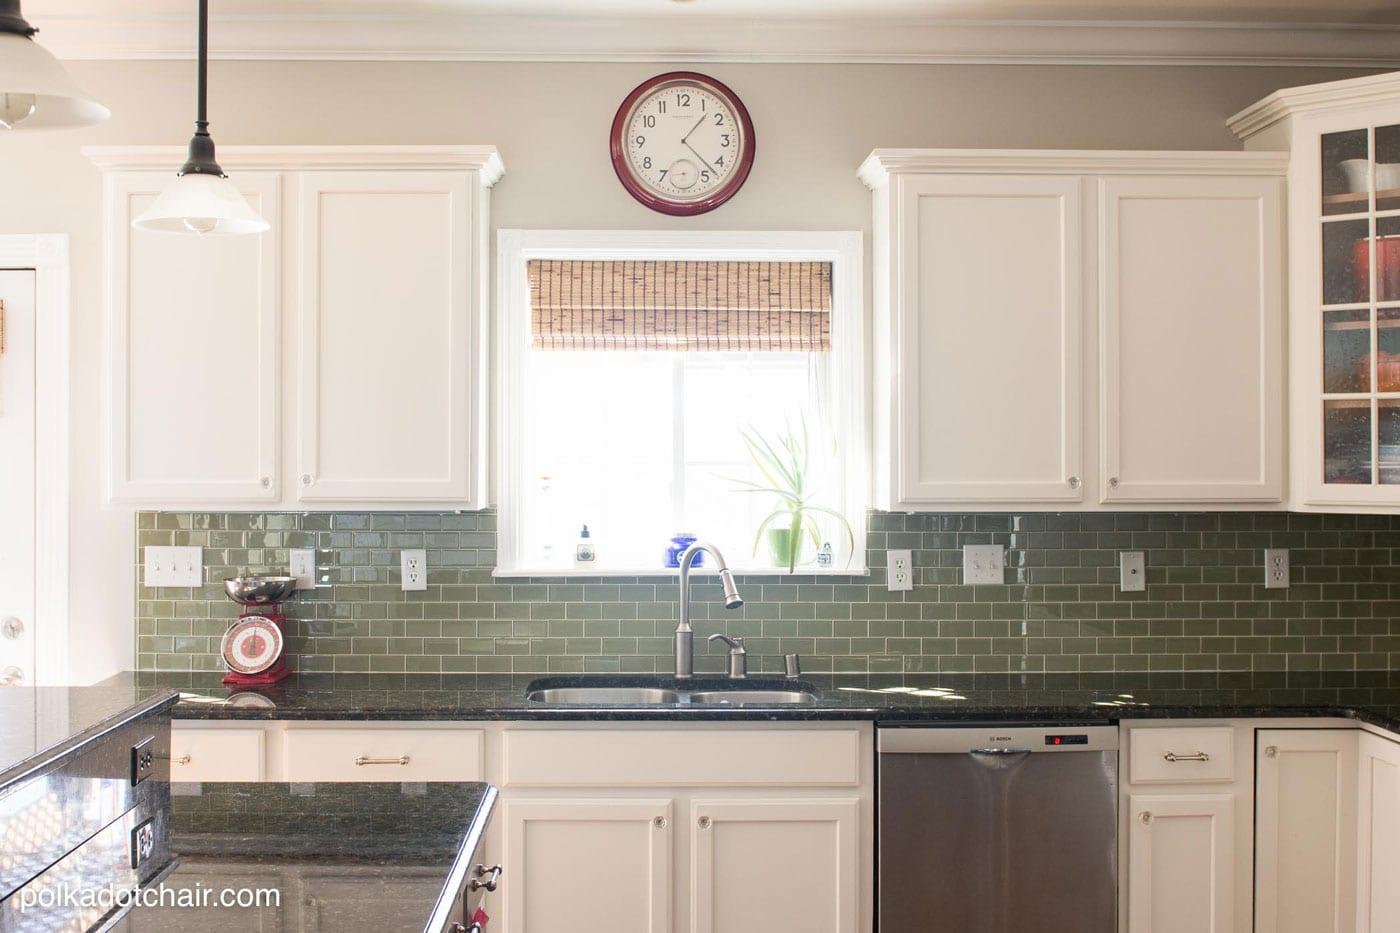 Home Repair Secrets Handymen Won't Tell You| Home Repair Hacks, Home Repair Tips and Tricks, Home Improvement Hacks, Home Improvement TIps and Tricks, Popular Pin